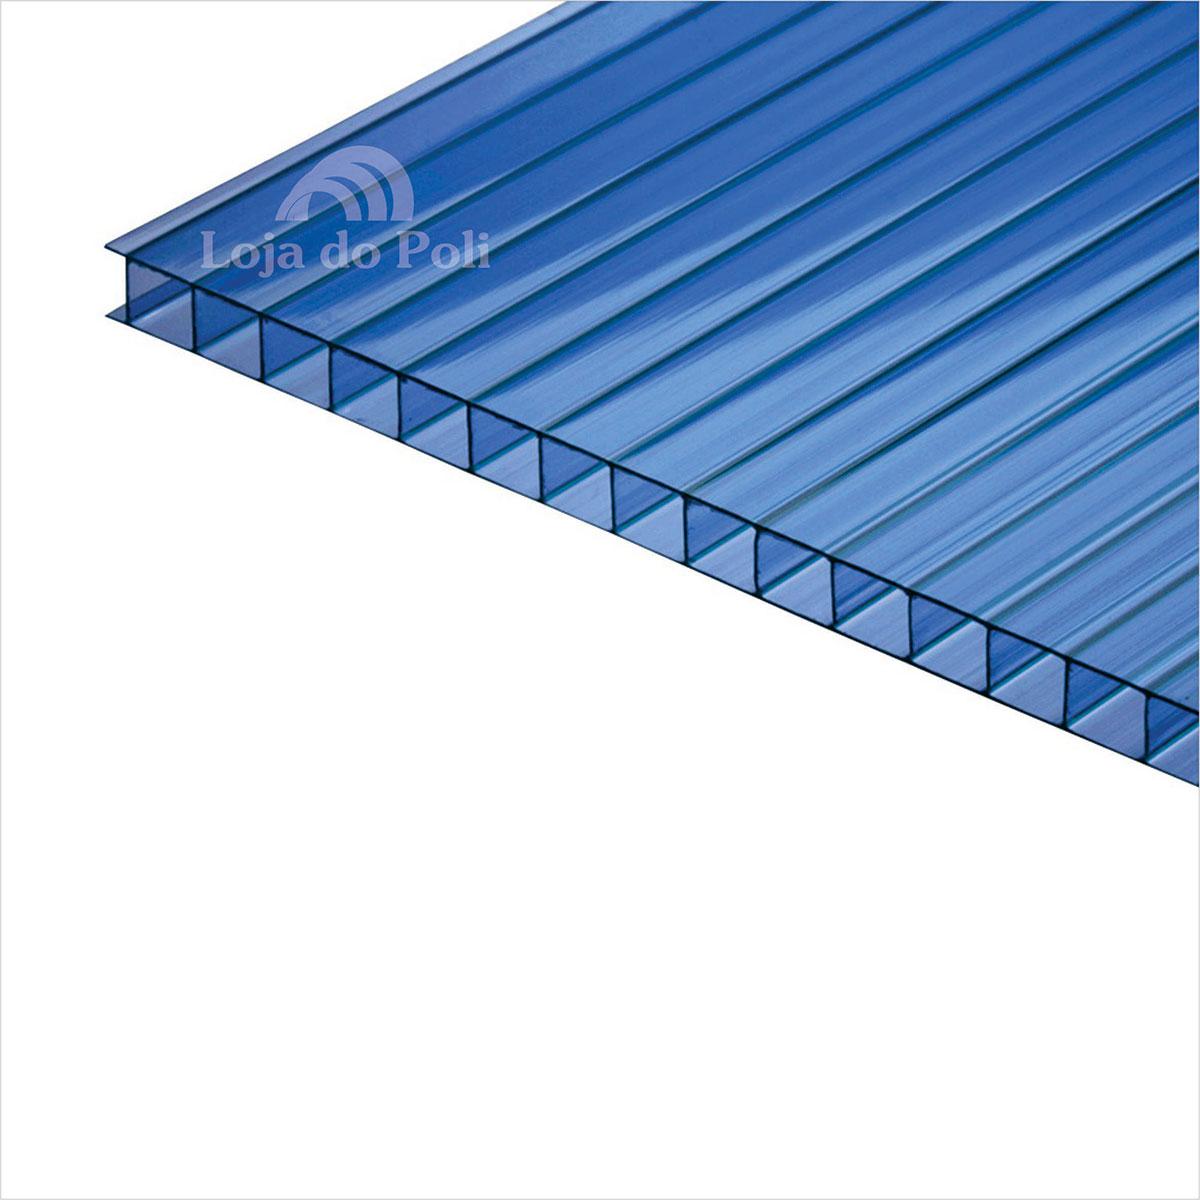 Chapa Policarbonato Alveolar Azul 10mm 1,0x6,0m